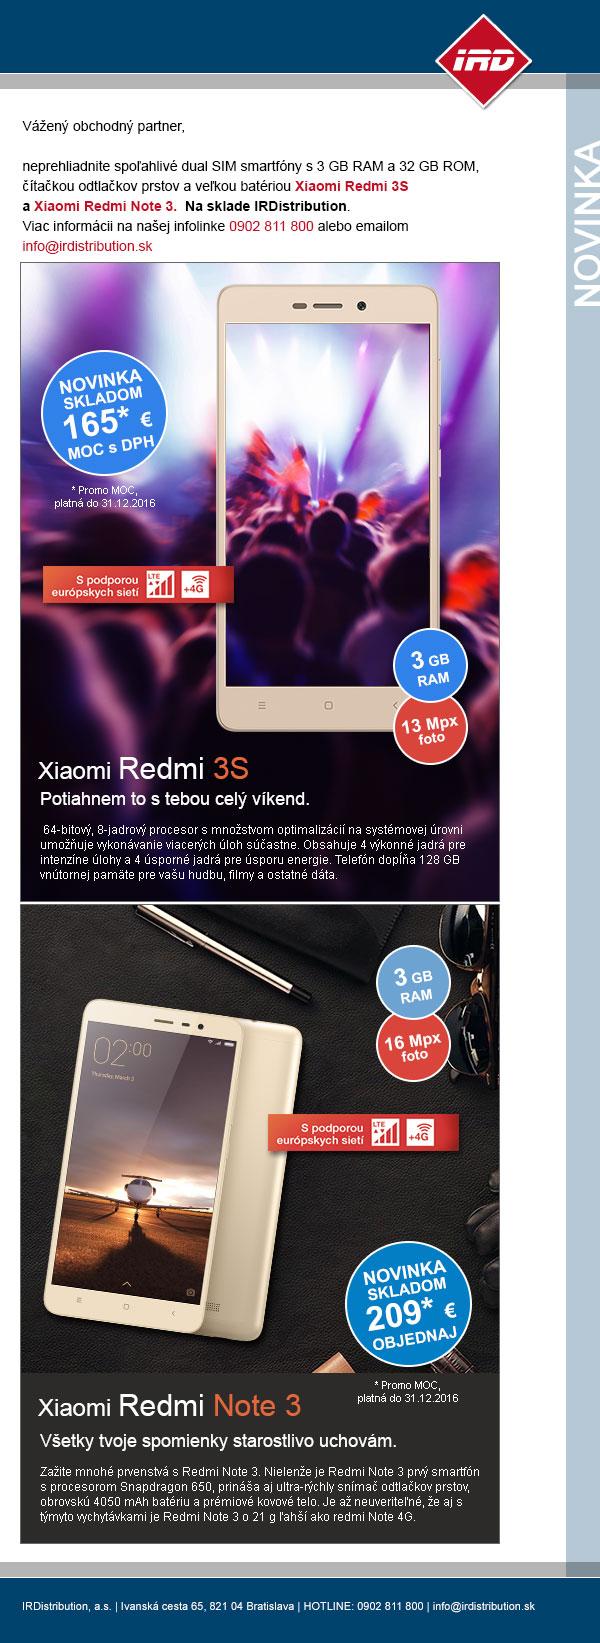 xiaomi-redmi-3s-redmi-note3